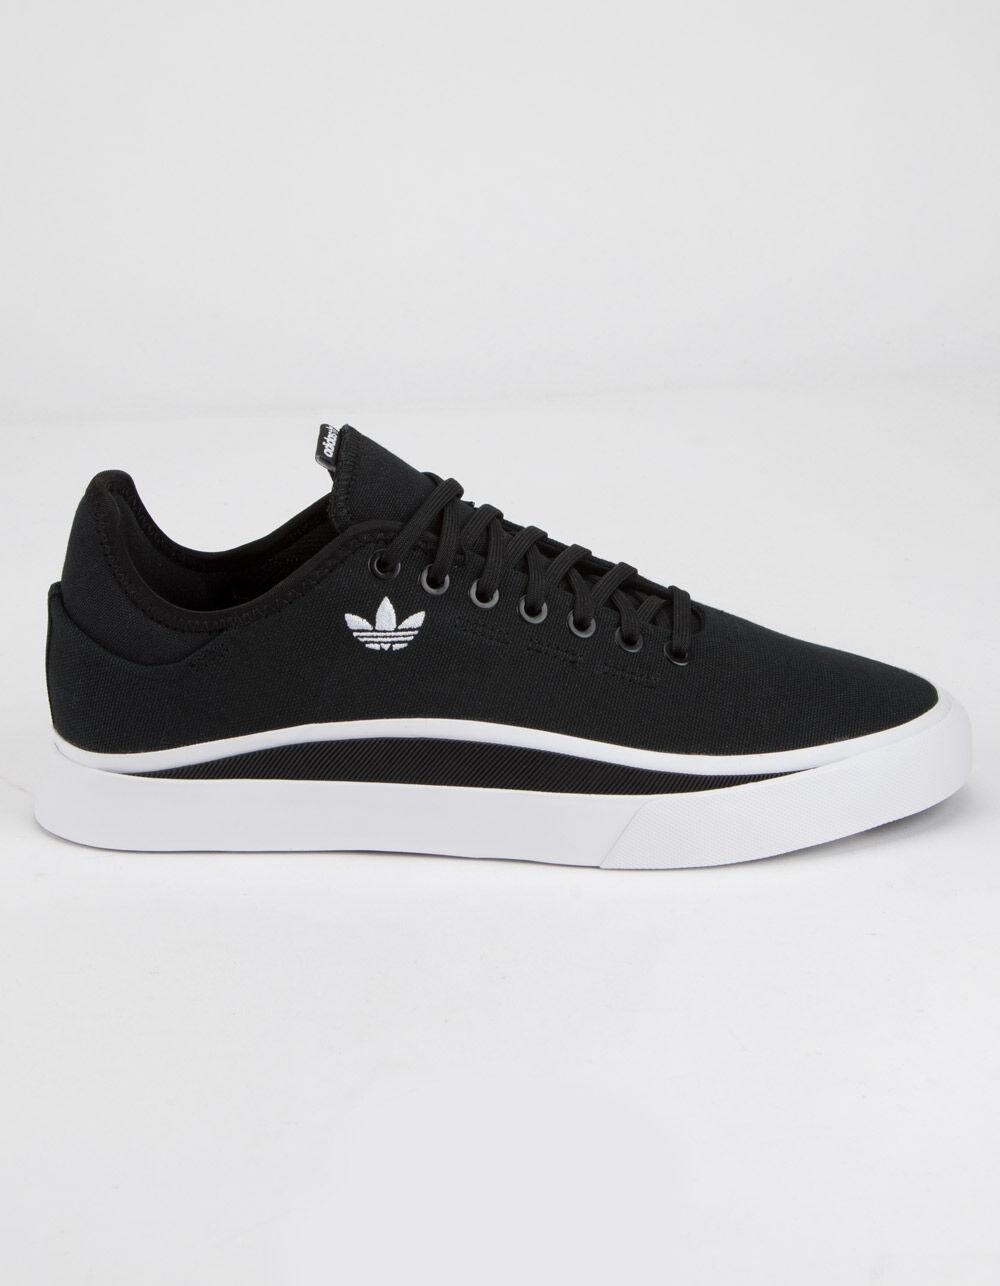 ADIDAS Sabalo Core Black & Cloud White Shoes